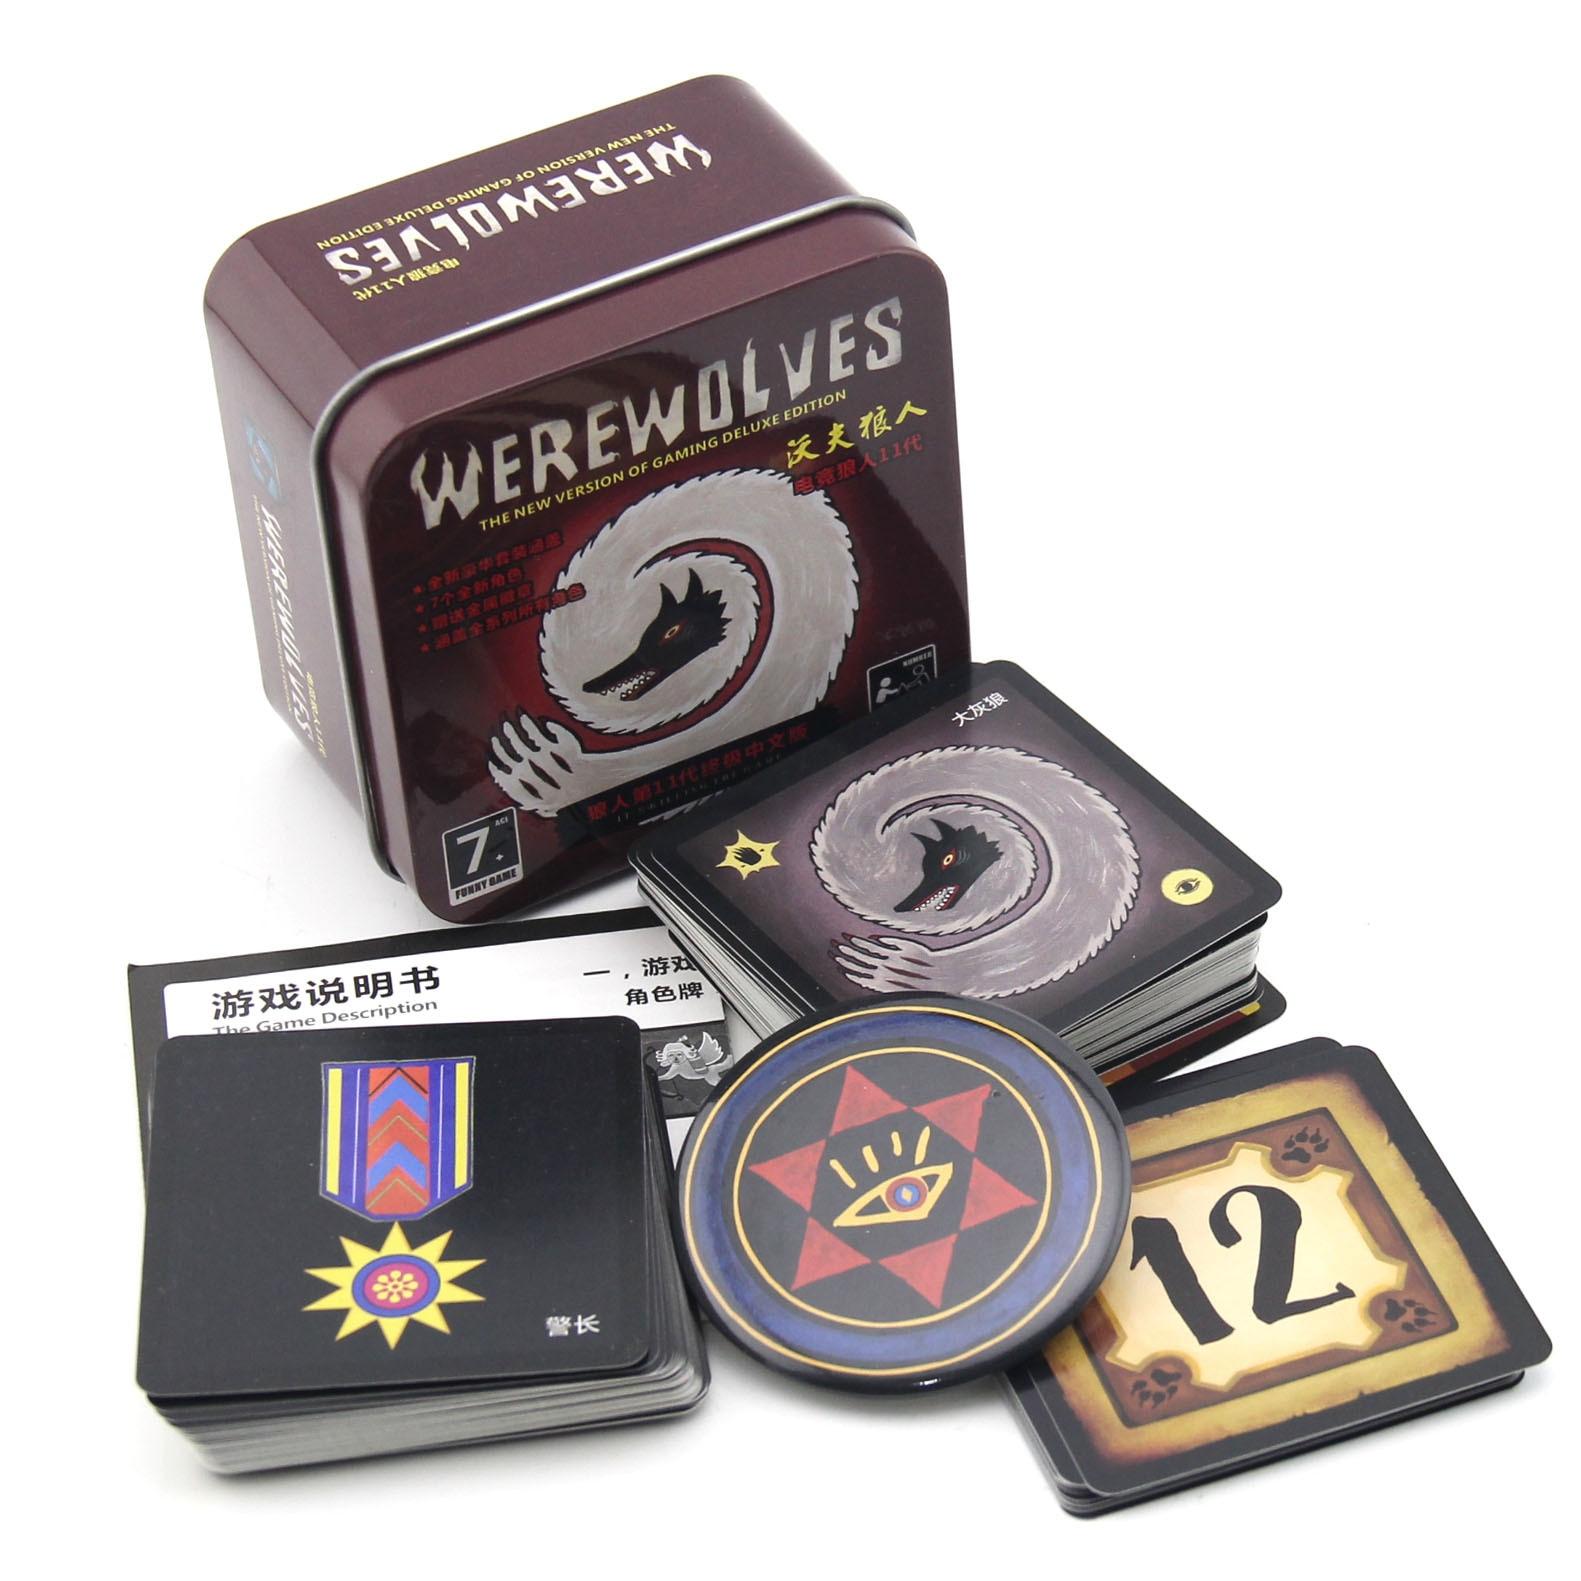 wolf-e-sports-werewolf-kill-game-11-generation-mini-portable-iron-box-multi-seat-board-game-cards-dark-please-eye-closed-font-b-poker-b-font